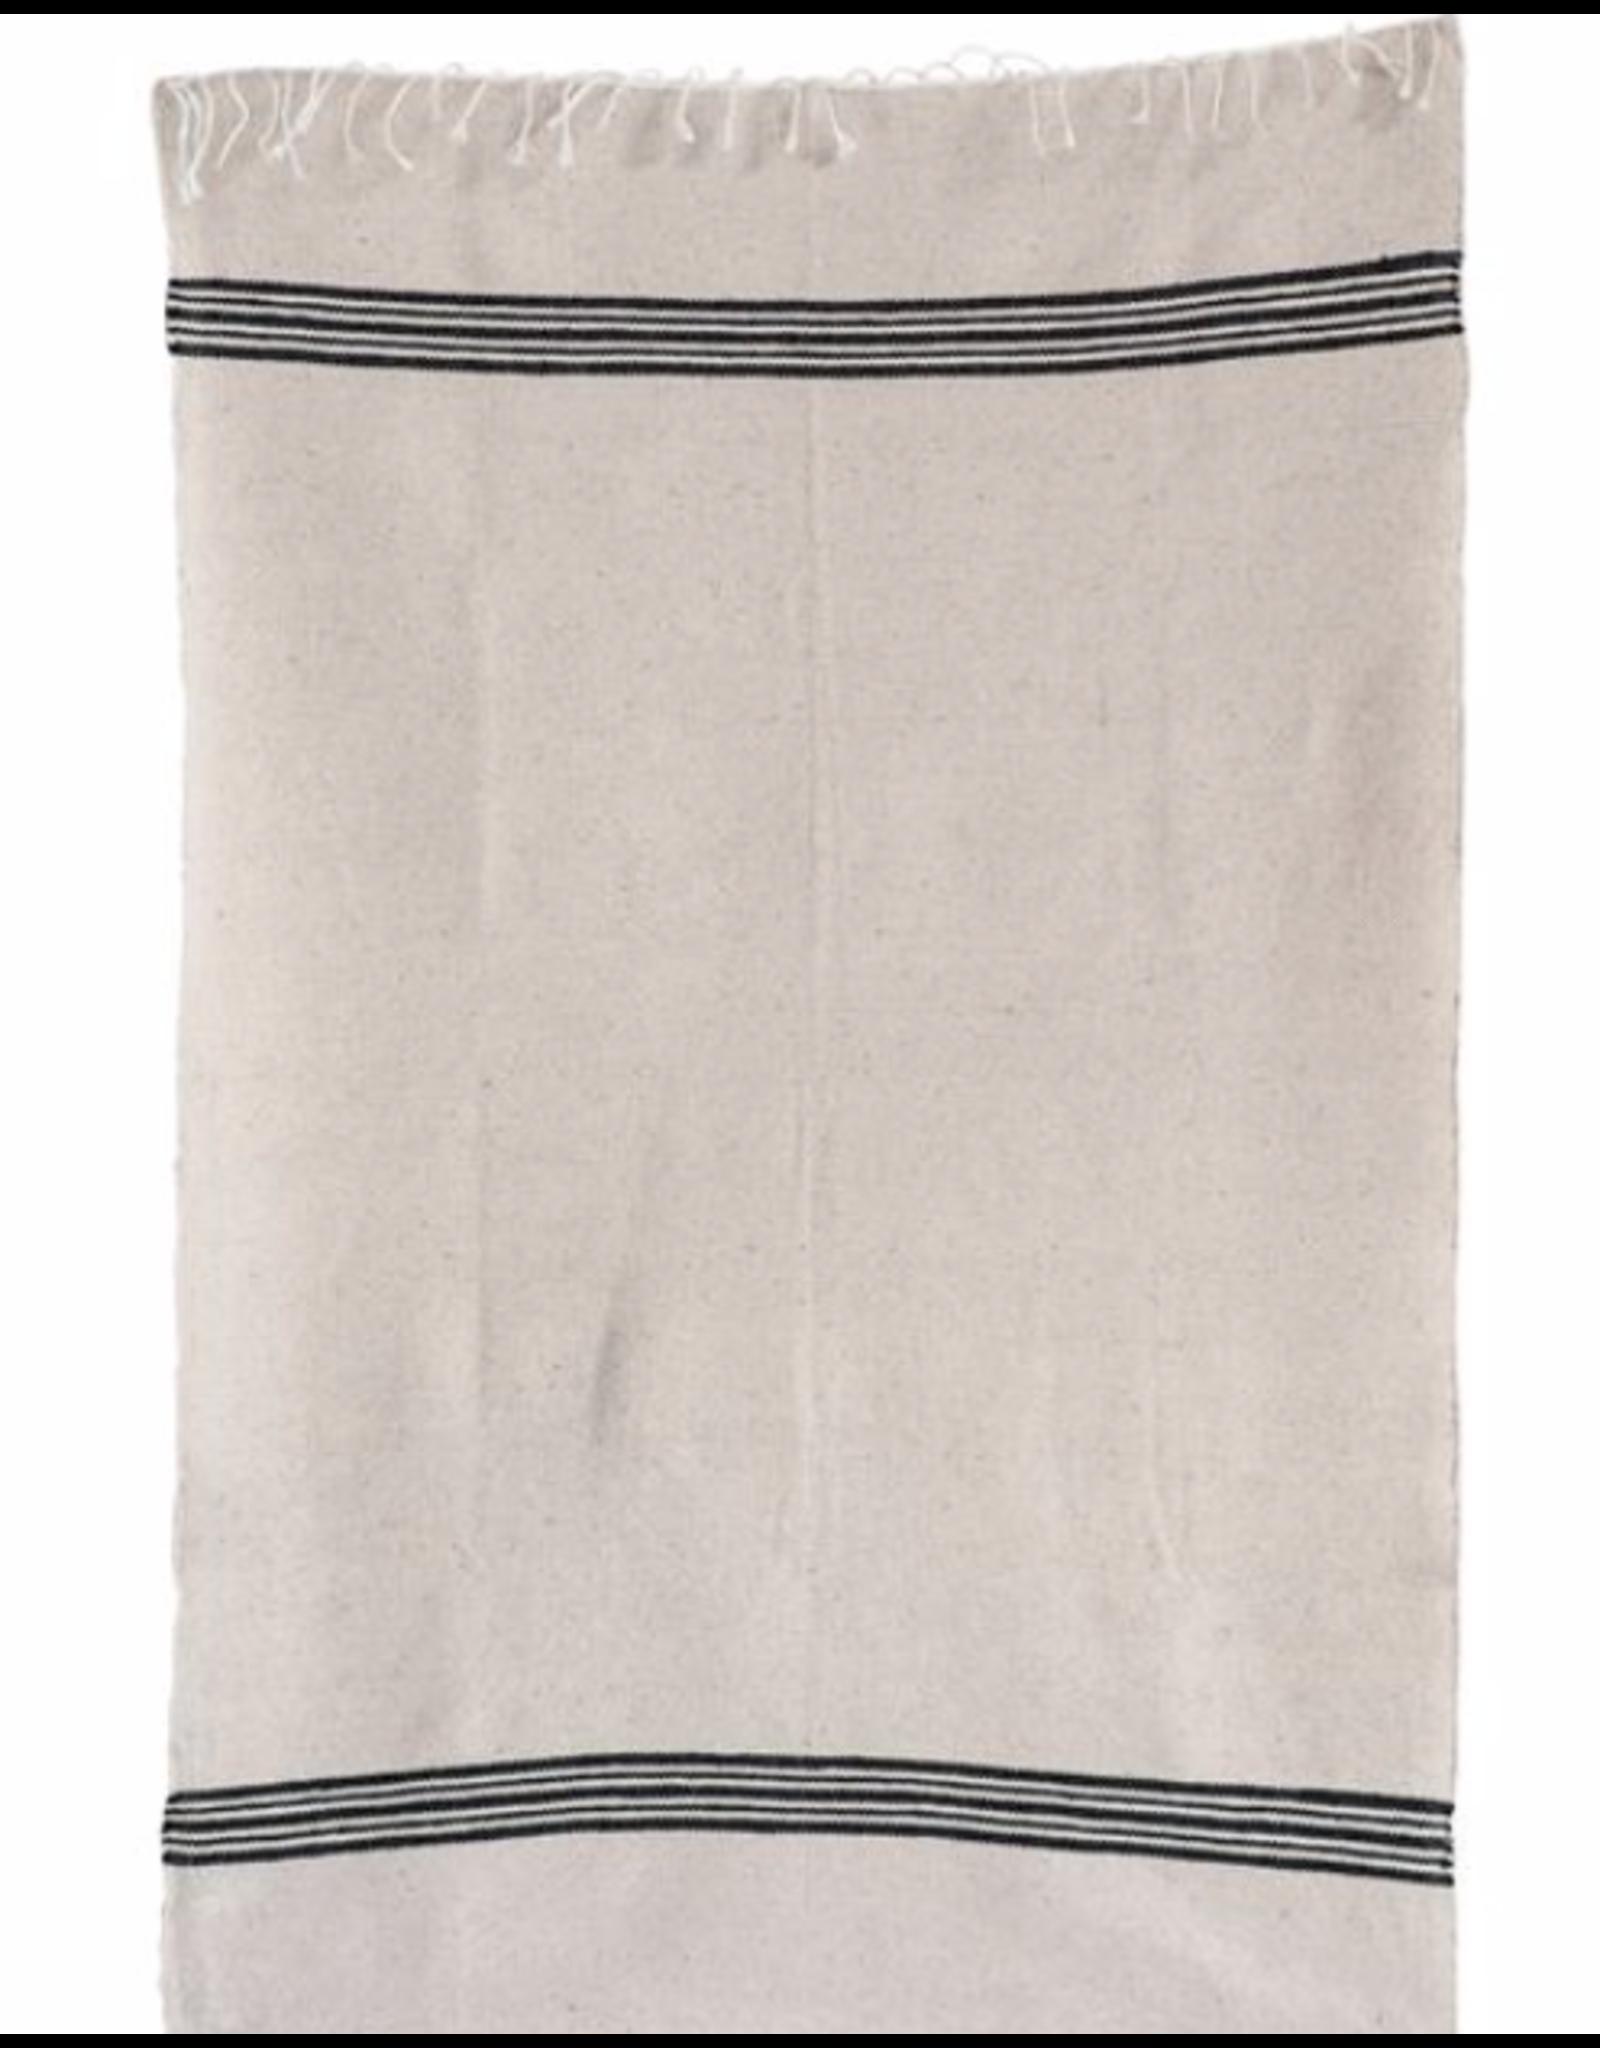 Hand-Loomed Cotton Hand Towel w/ Fringe